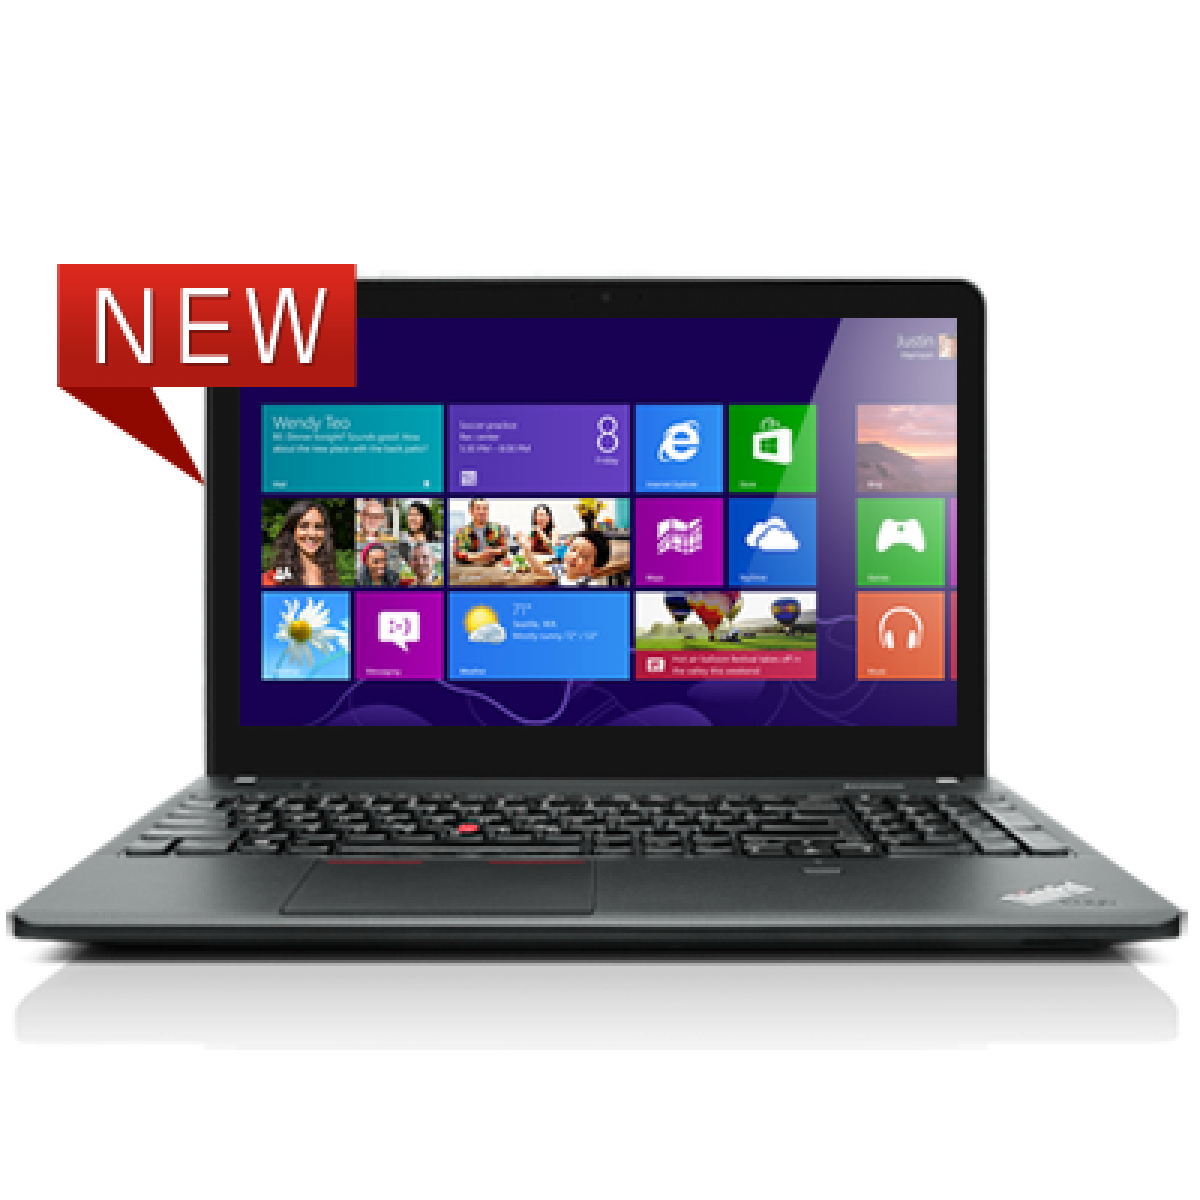 Lenovo ThinkPad Edge E540 Haswell Core I7